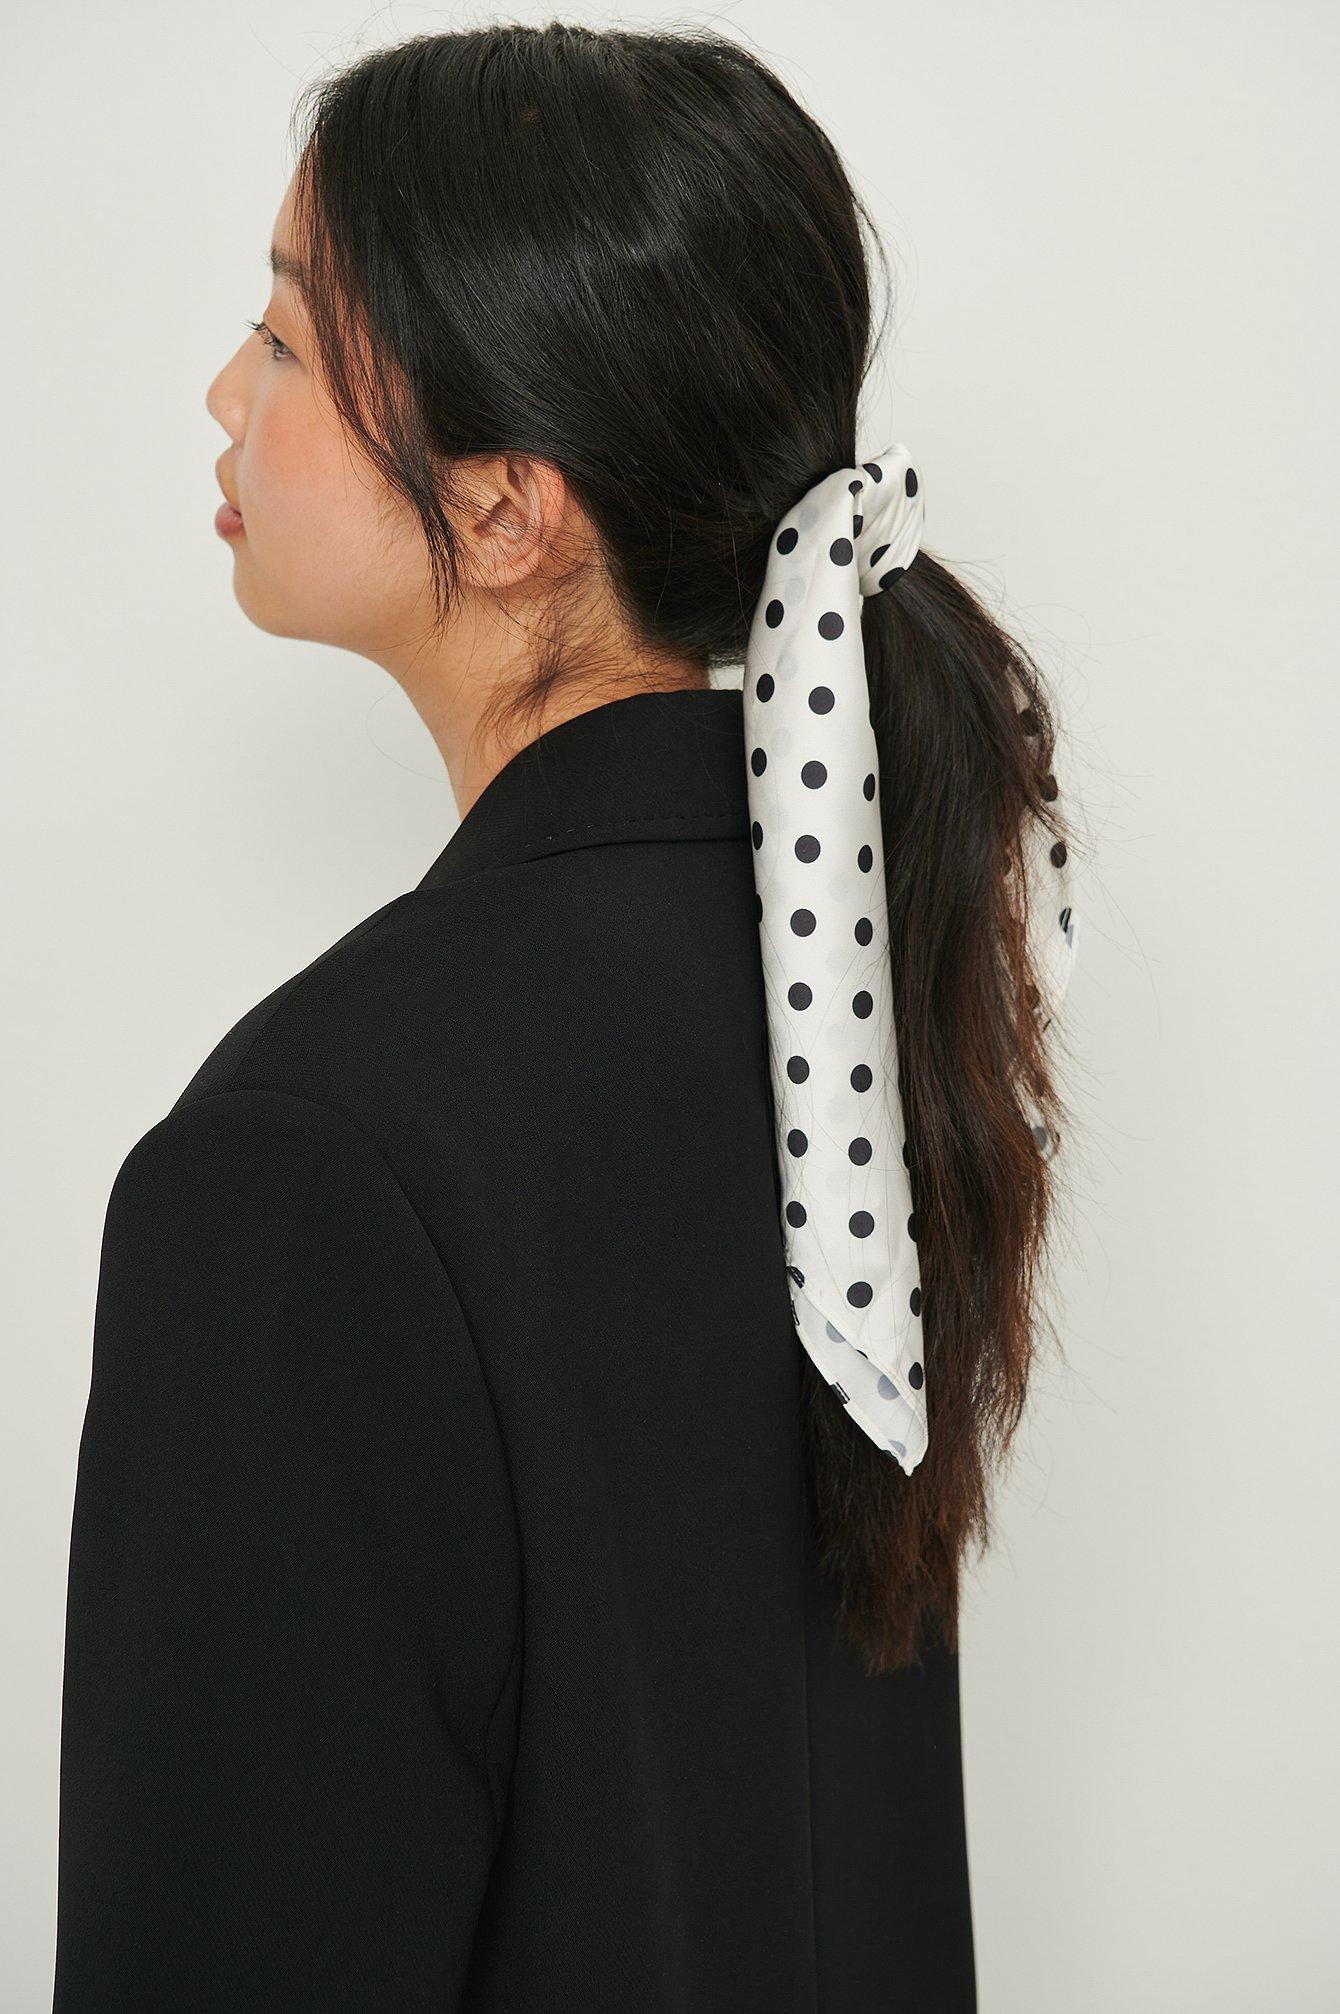 na-kd accessories -  Bedrucktes Haartuch Aus Recyceltem Material - White